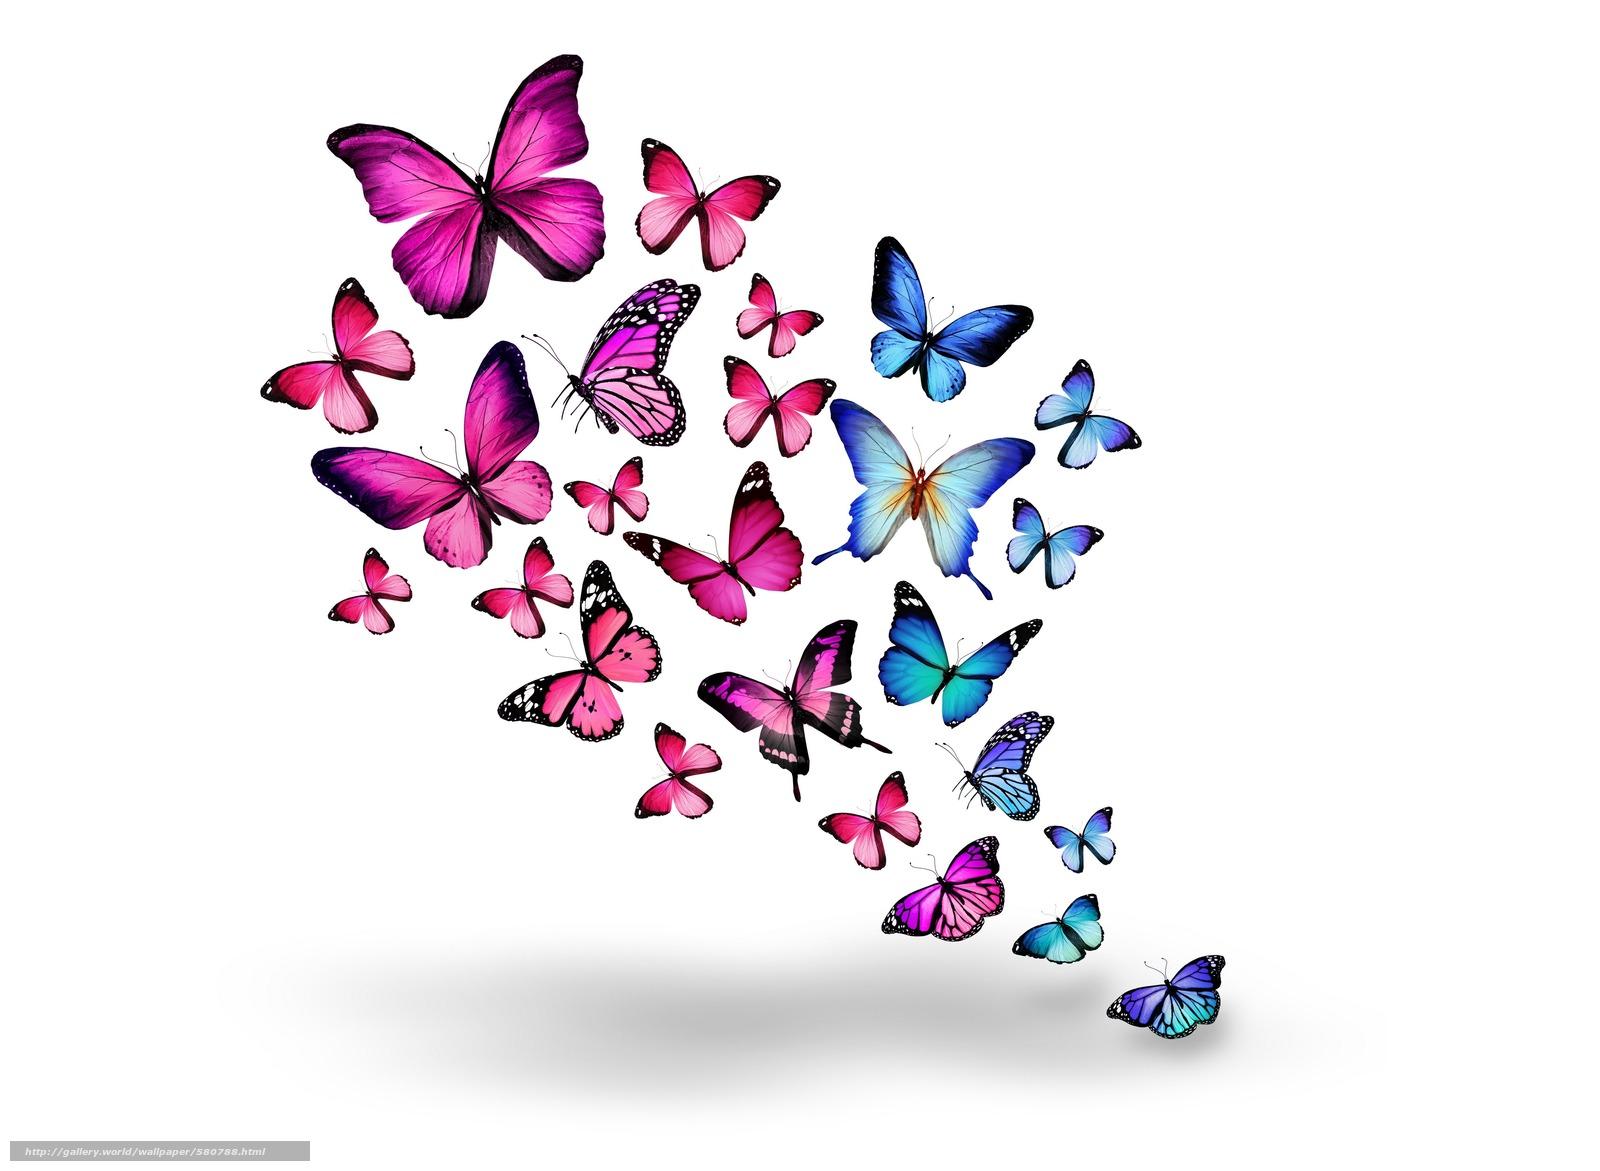 Scaricare gli sfondi blu rosa farfalle sfondi gratis per for Sfondi farfalle gratis